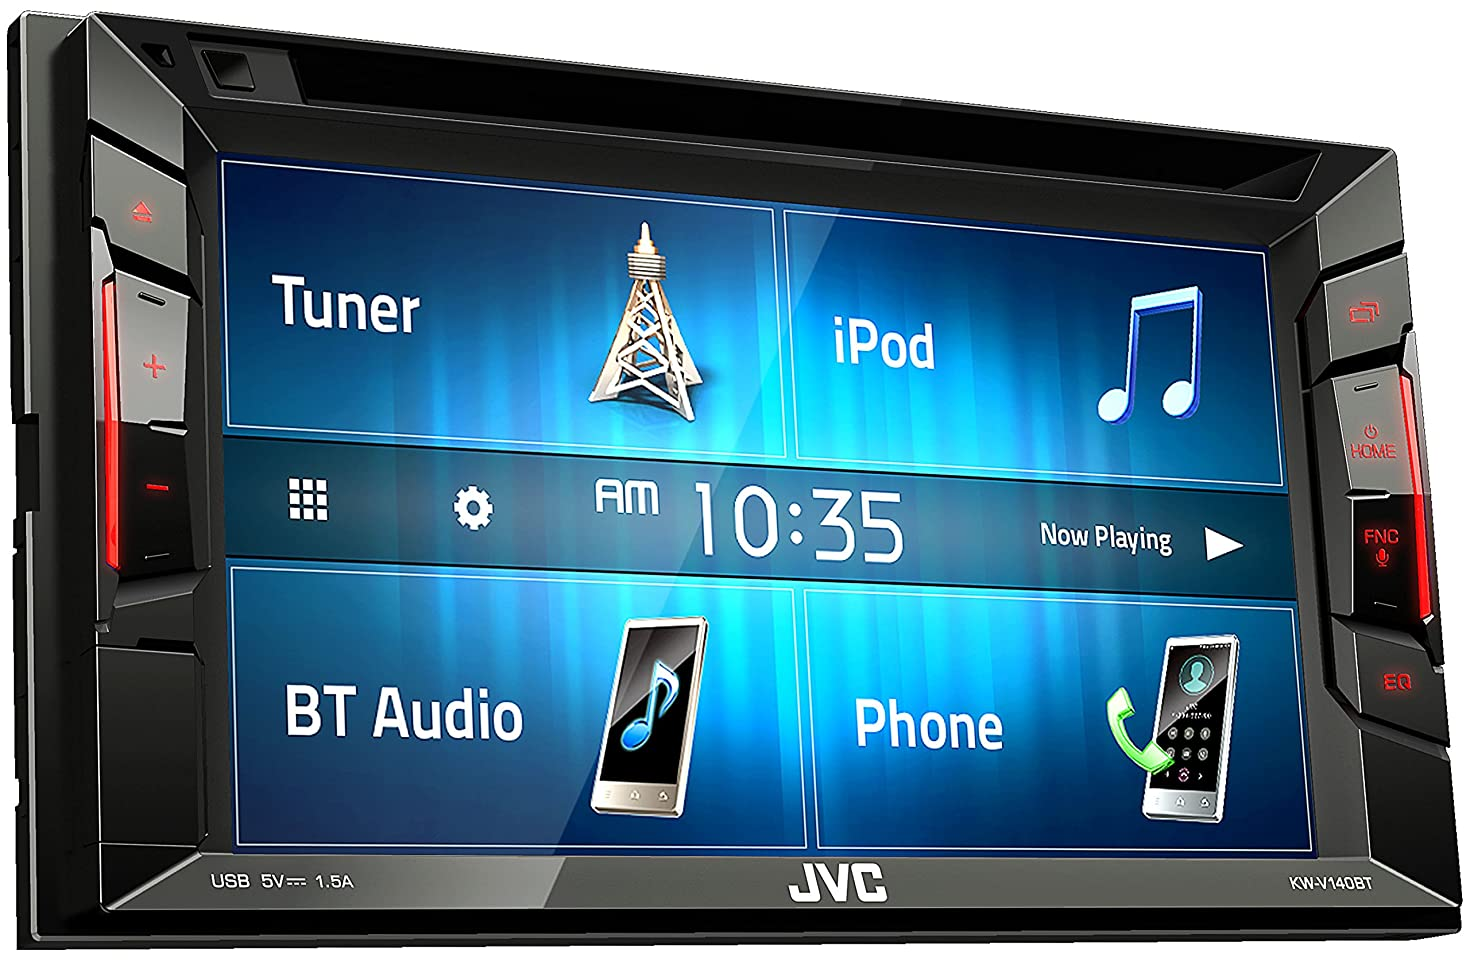 Jvc KWV140BT Double Din Bt in-Dash DVD/cd/am/fm Car Stereo W/6.2 Touchscreen (Renewed)